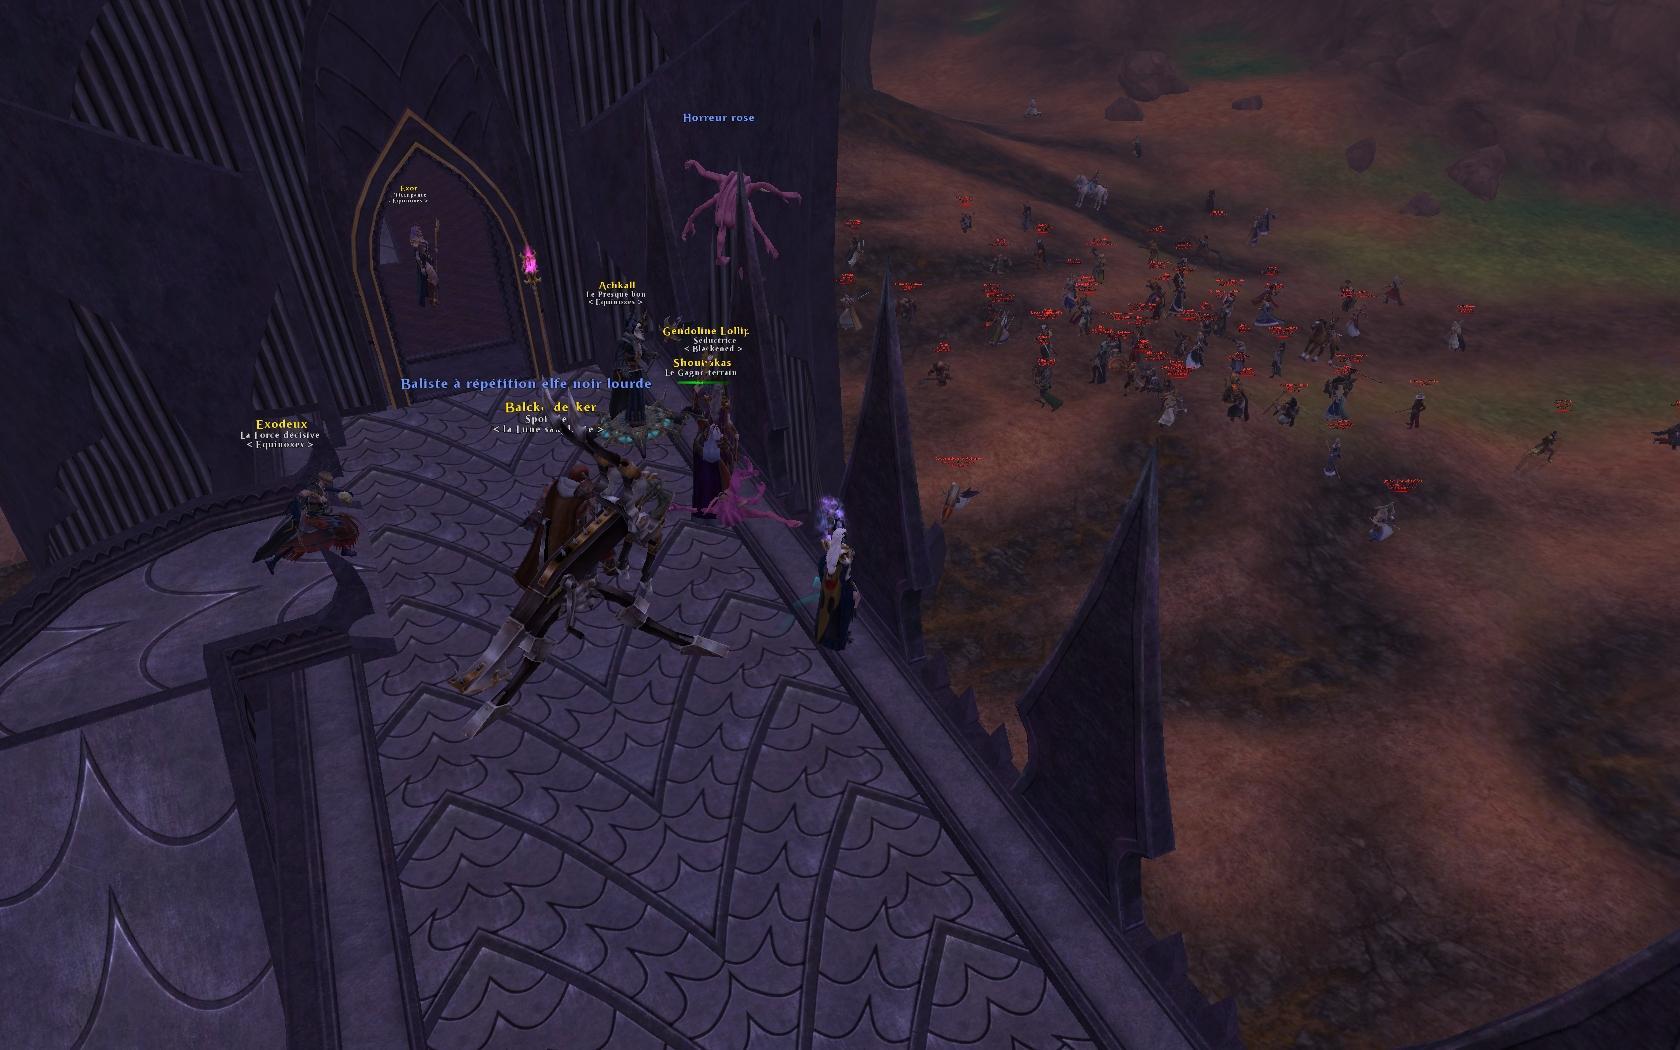 L'Ordre arrive à la forteresse